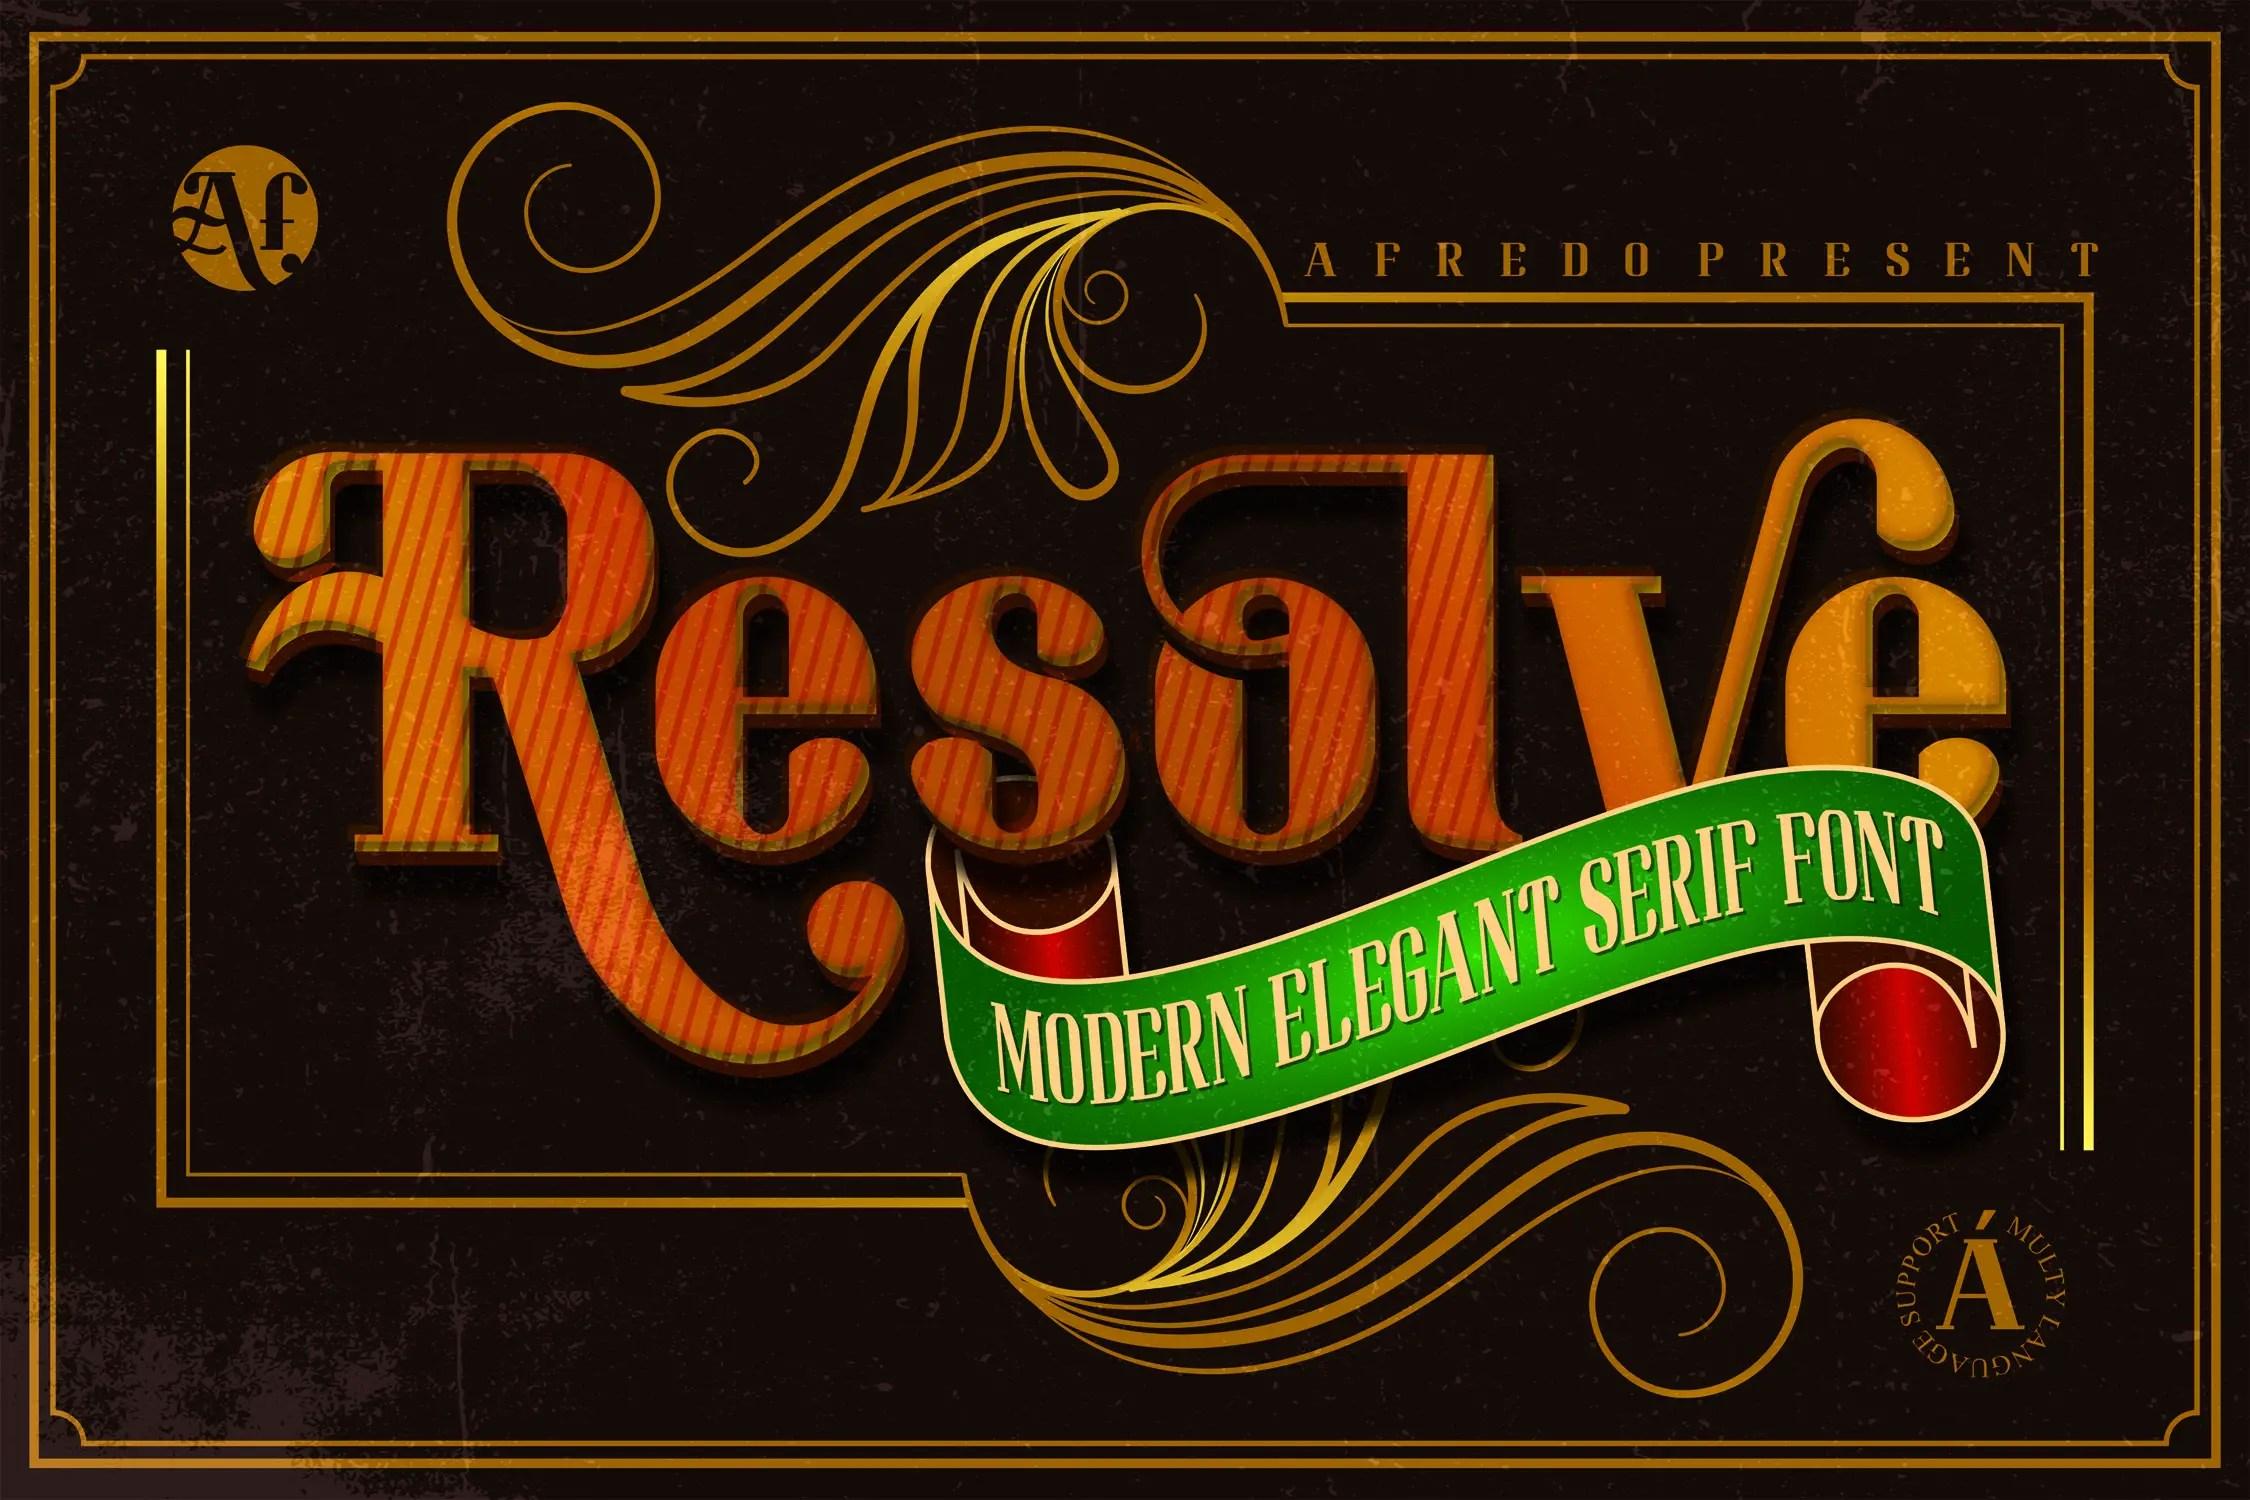 Resolve Modern Elegant Serif Font-1